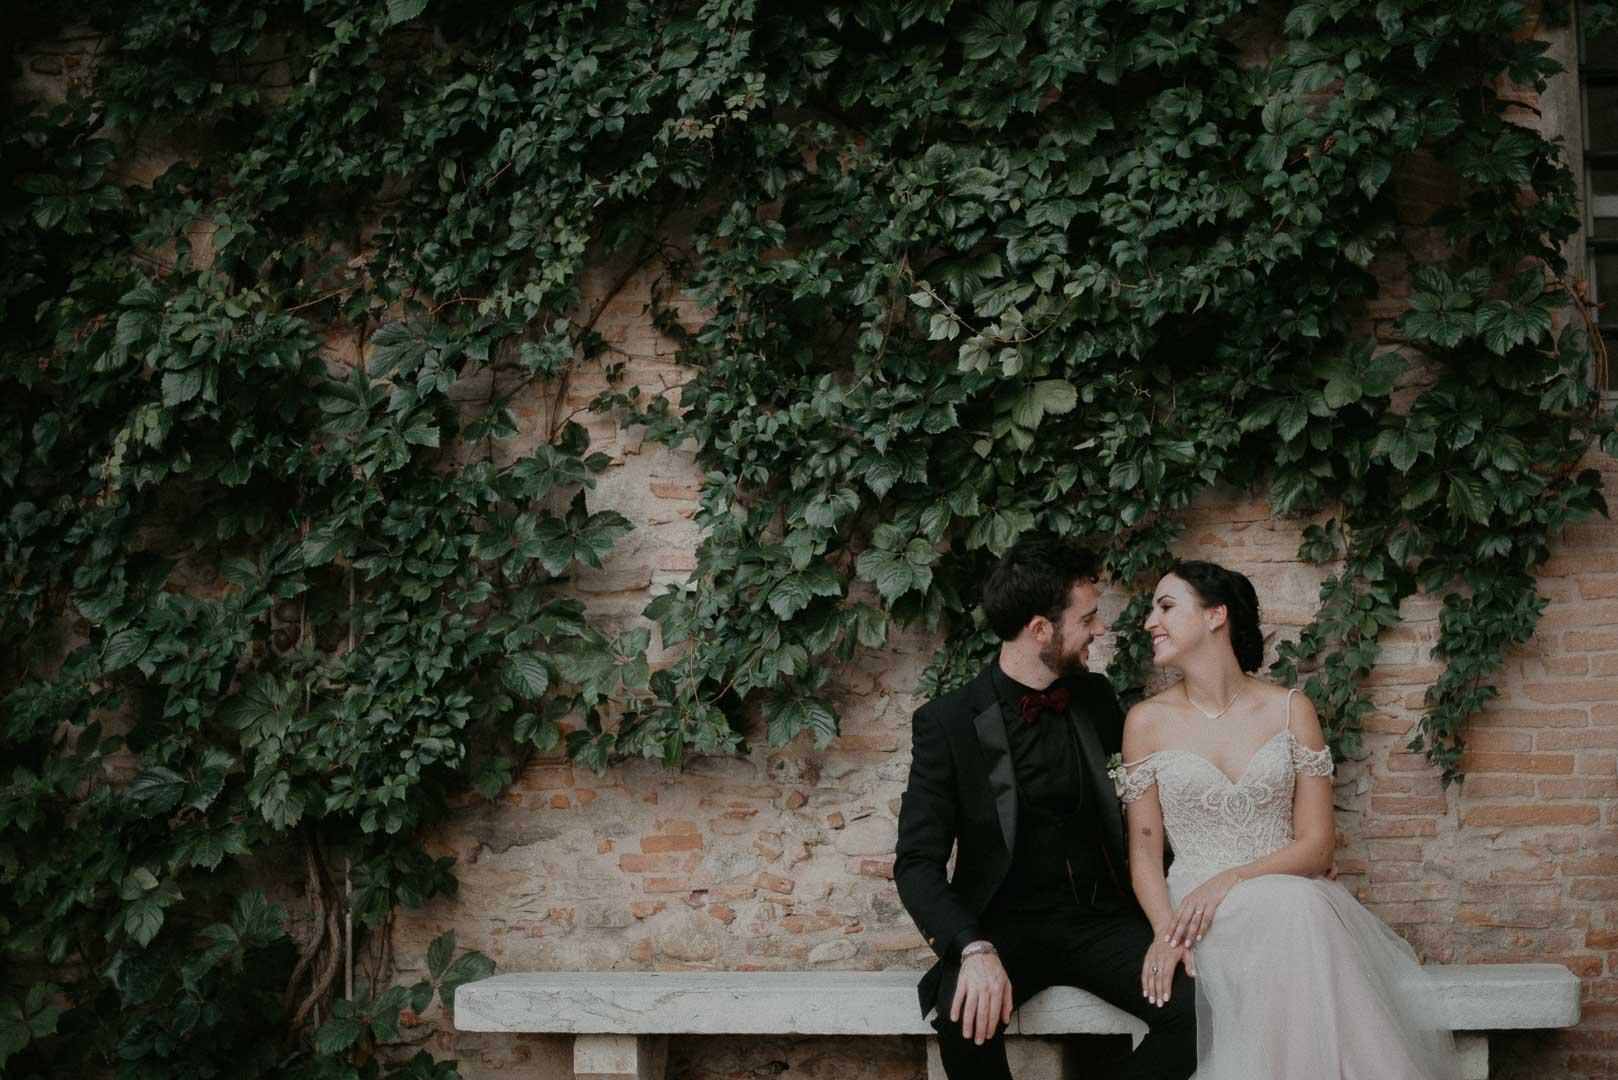 wedding-photographer-destination-fineart-bespoke-reportage-tuscany-villascorzi-vivianeizzo-spazio46-108